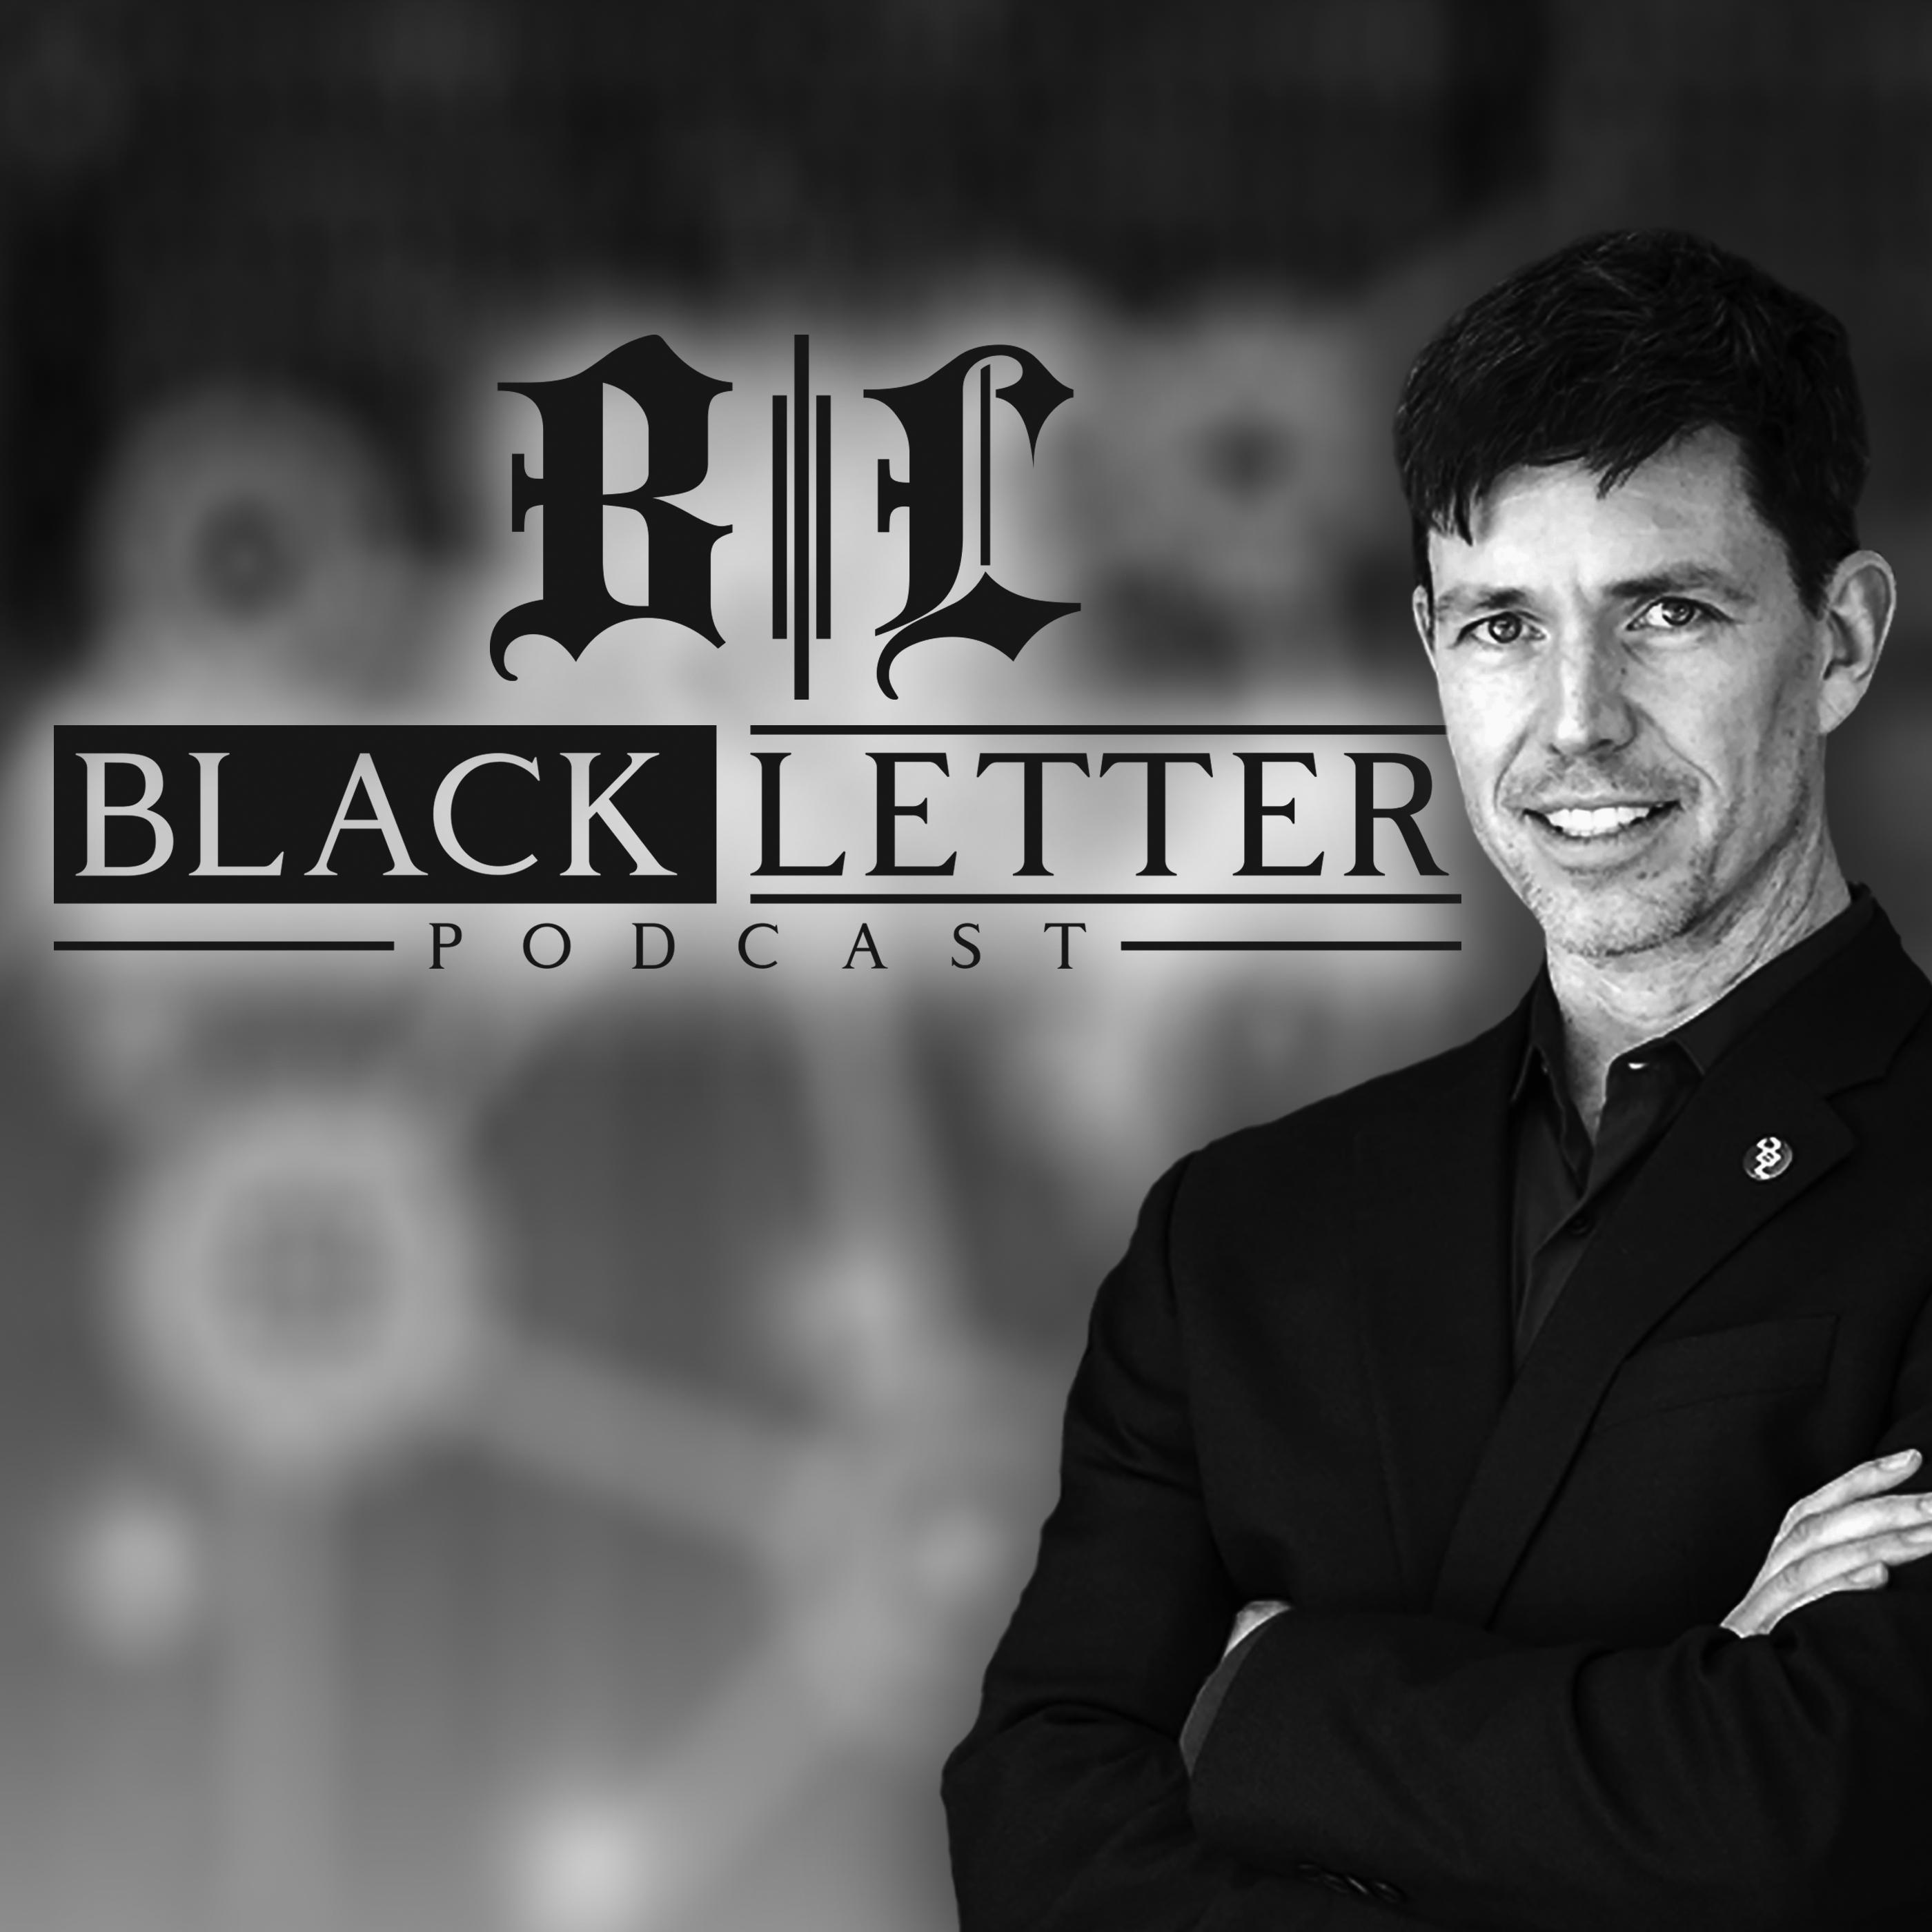 Blackletter show art